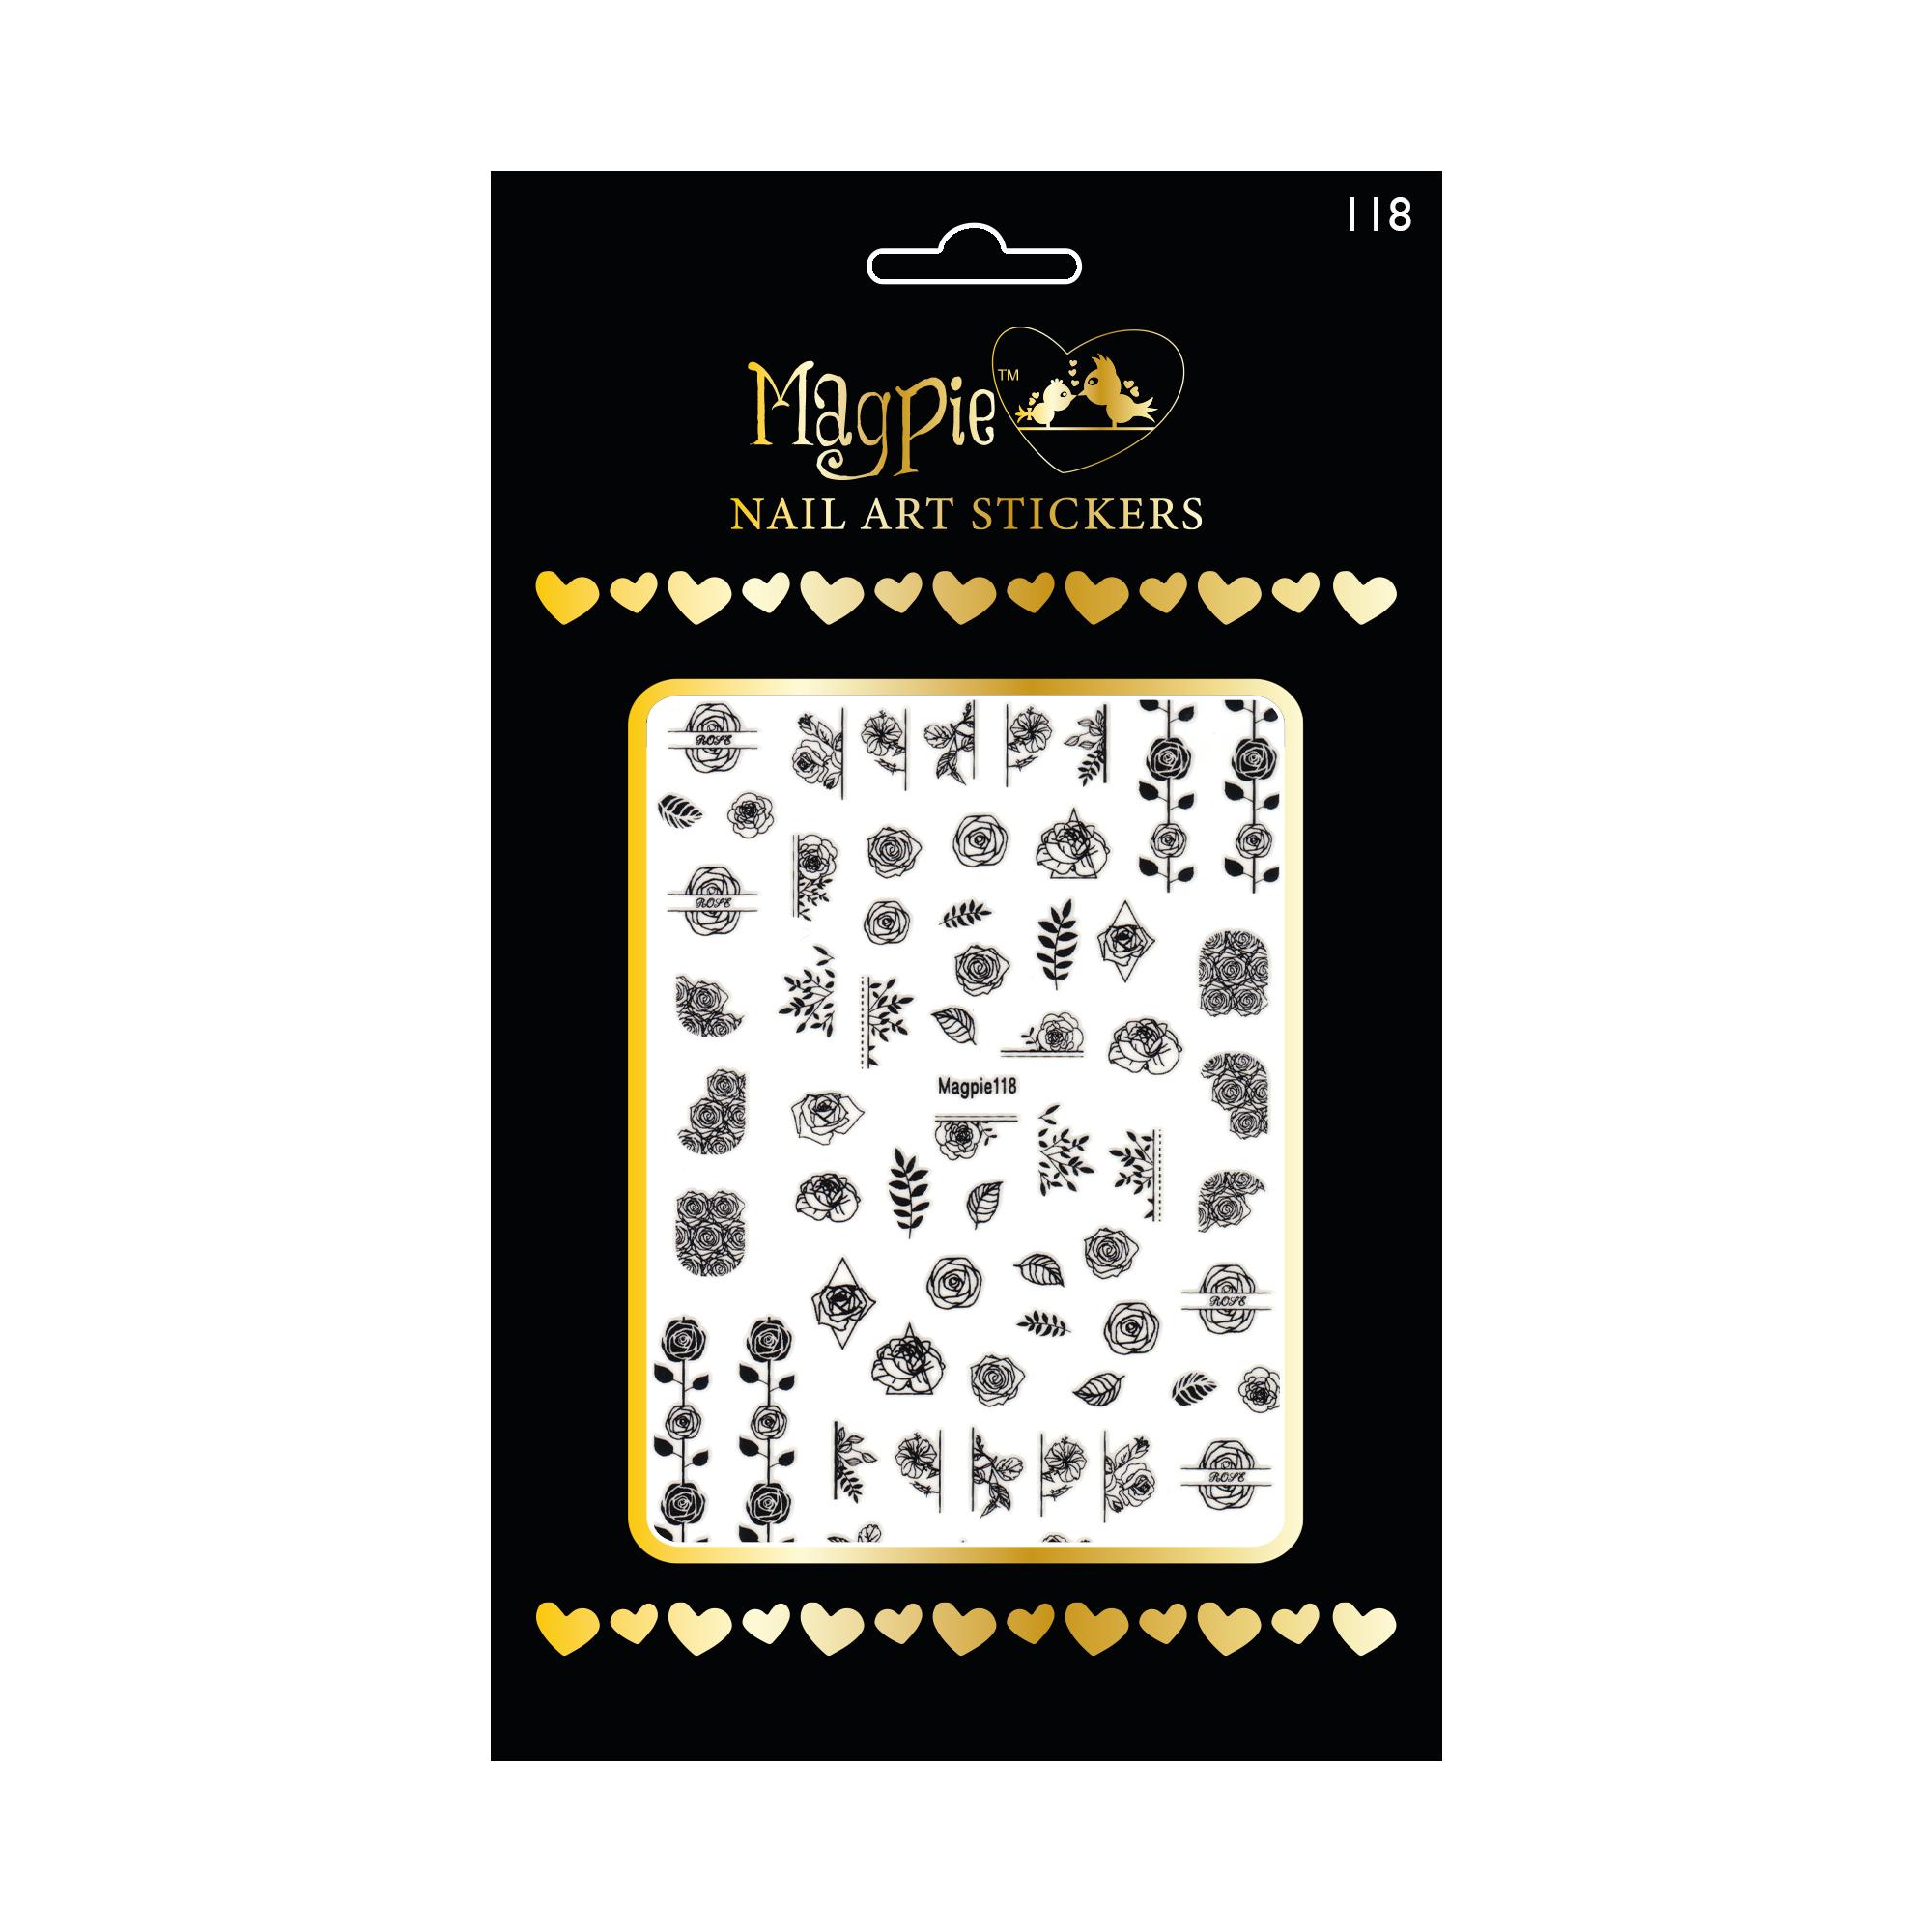 Magpie 118 stickers